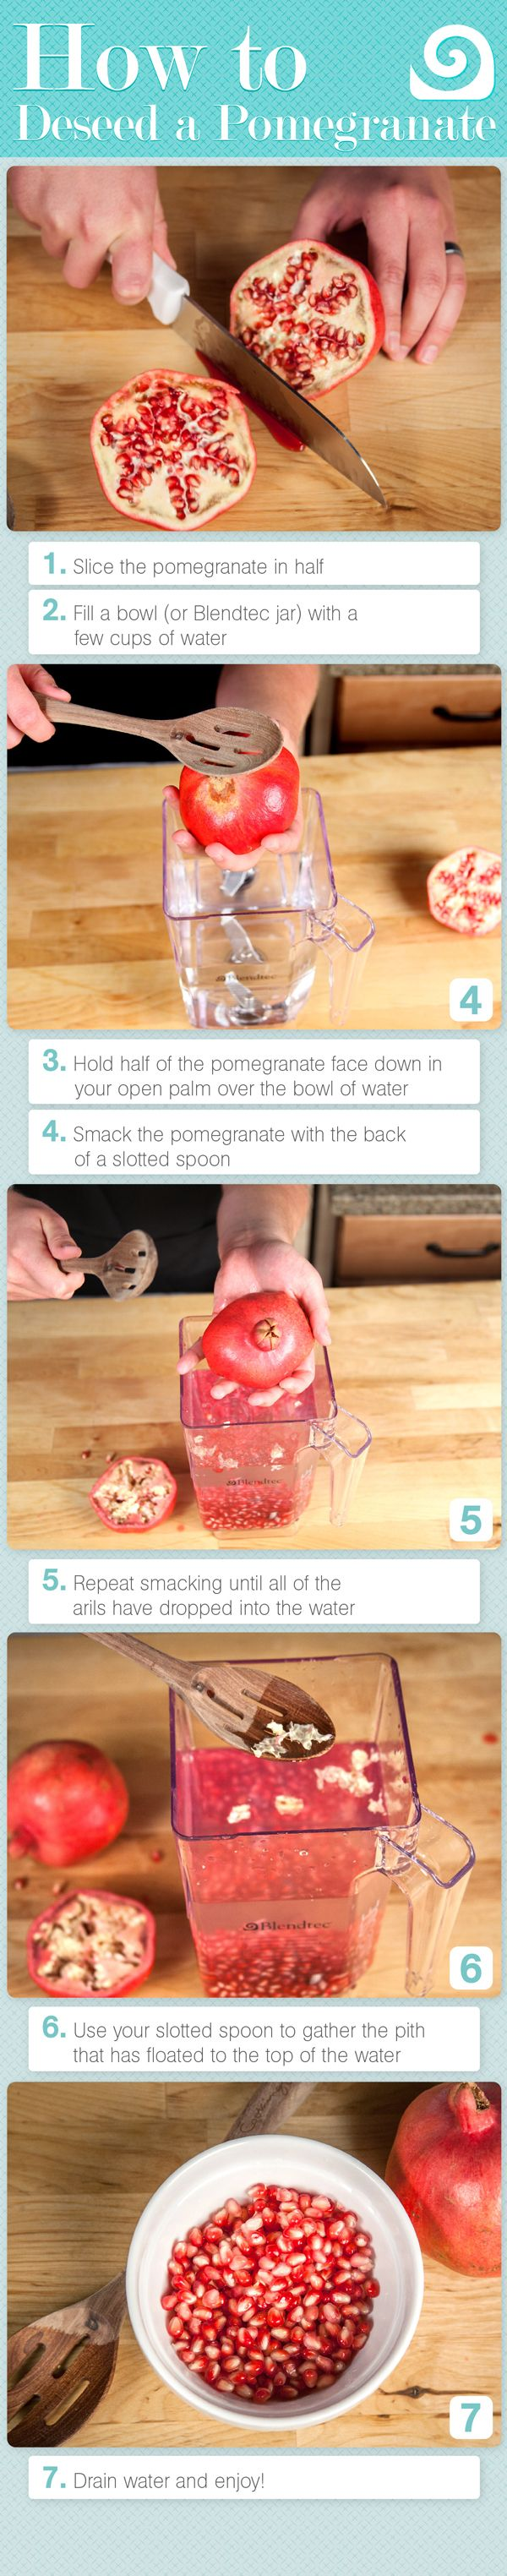 How to Deseed a Pomegranate diy diy ideas easy diy diy food diy fruit